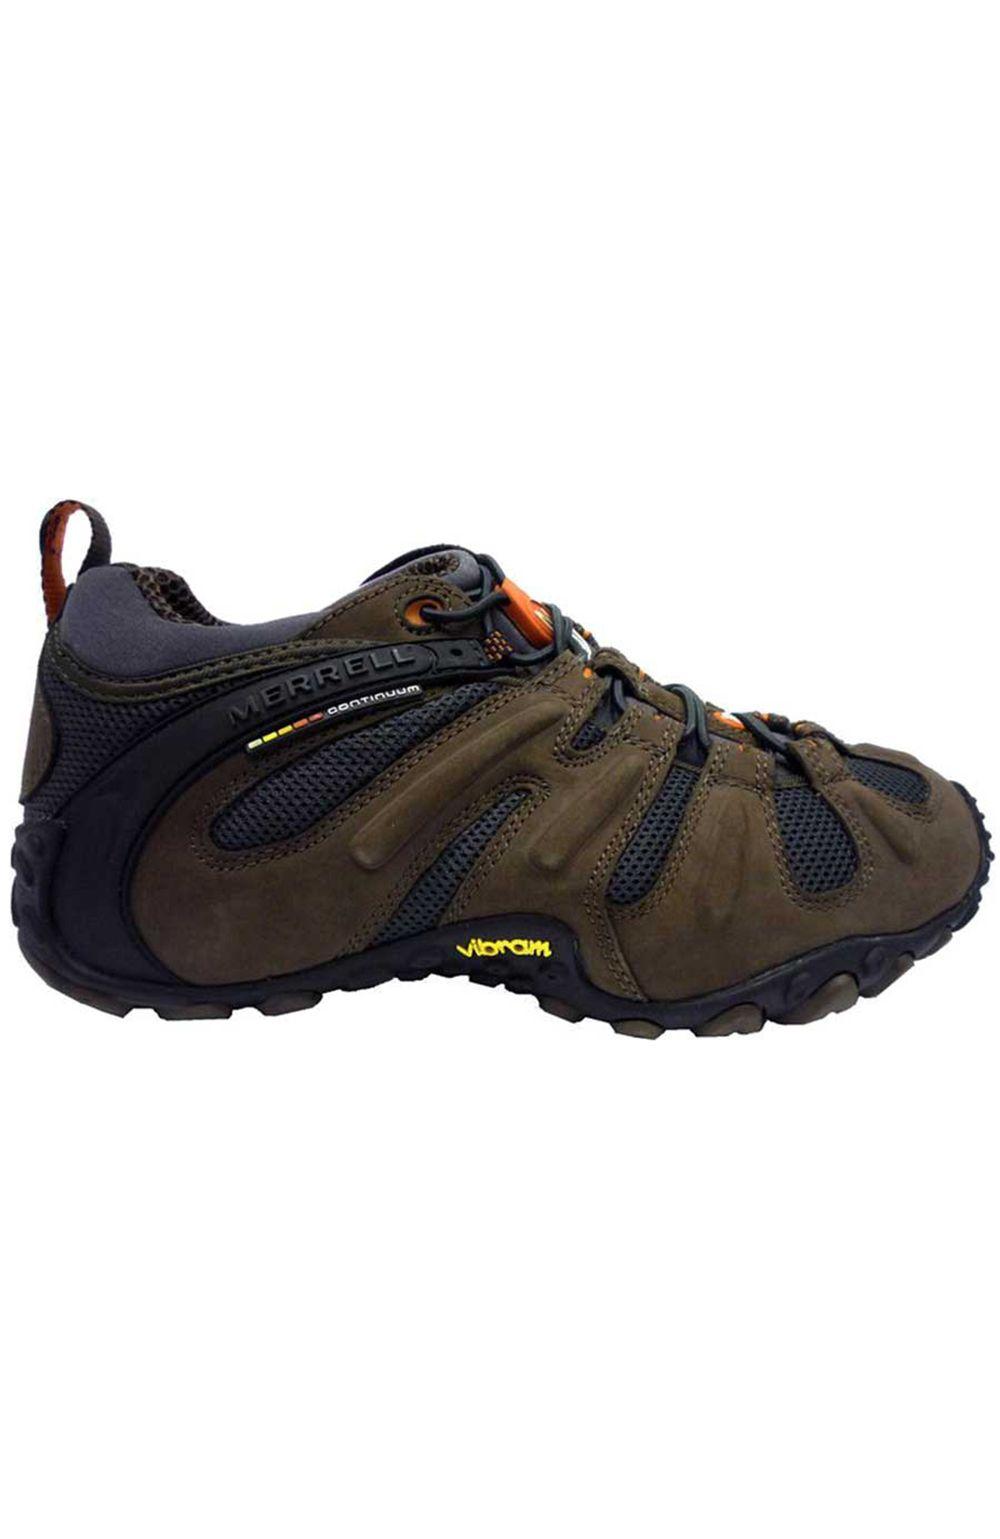 Merrell Shoes CHAM II STRETCH Merrell Stone/Granite